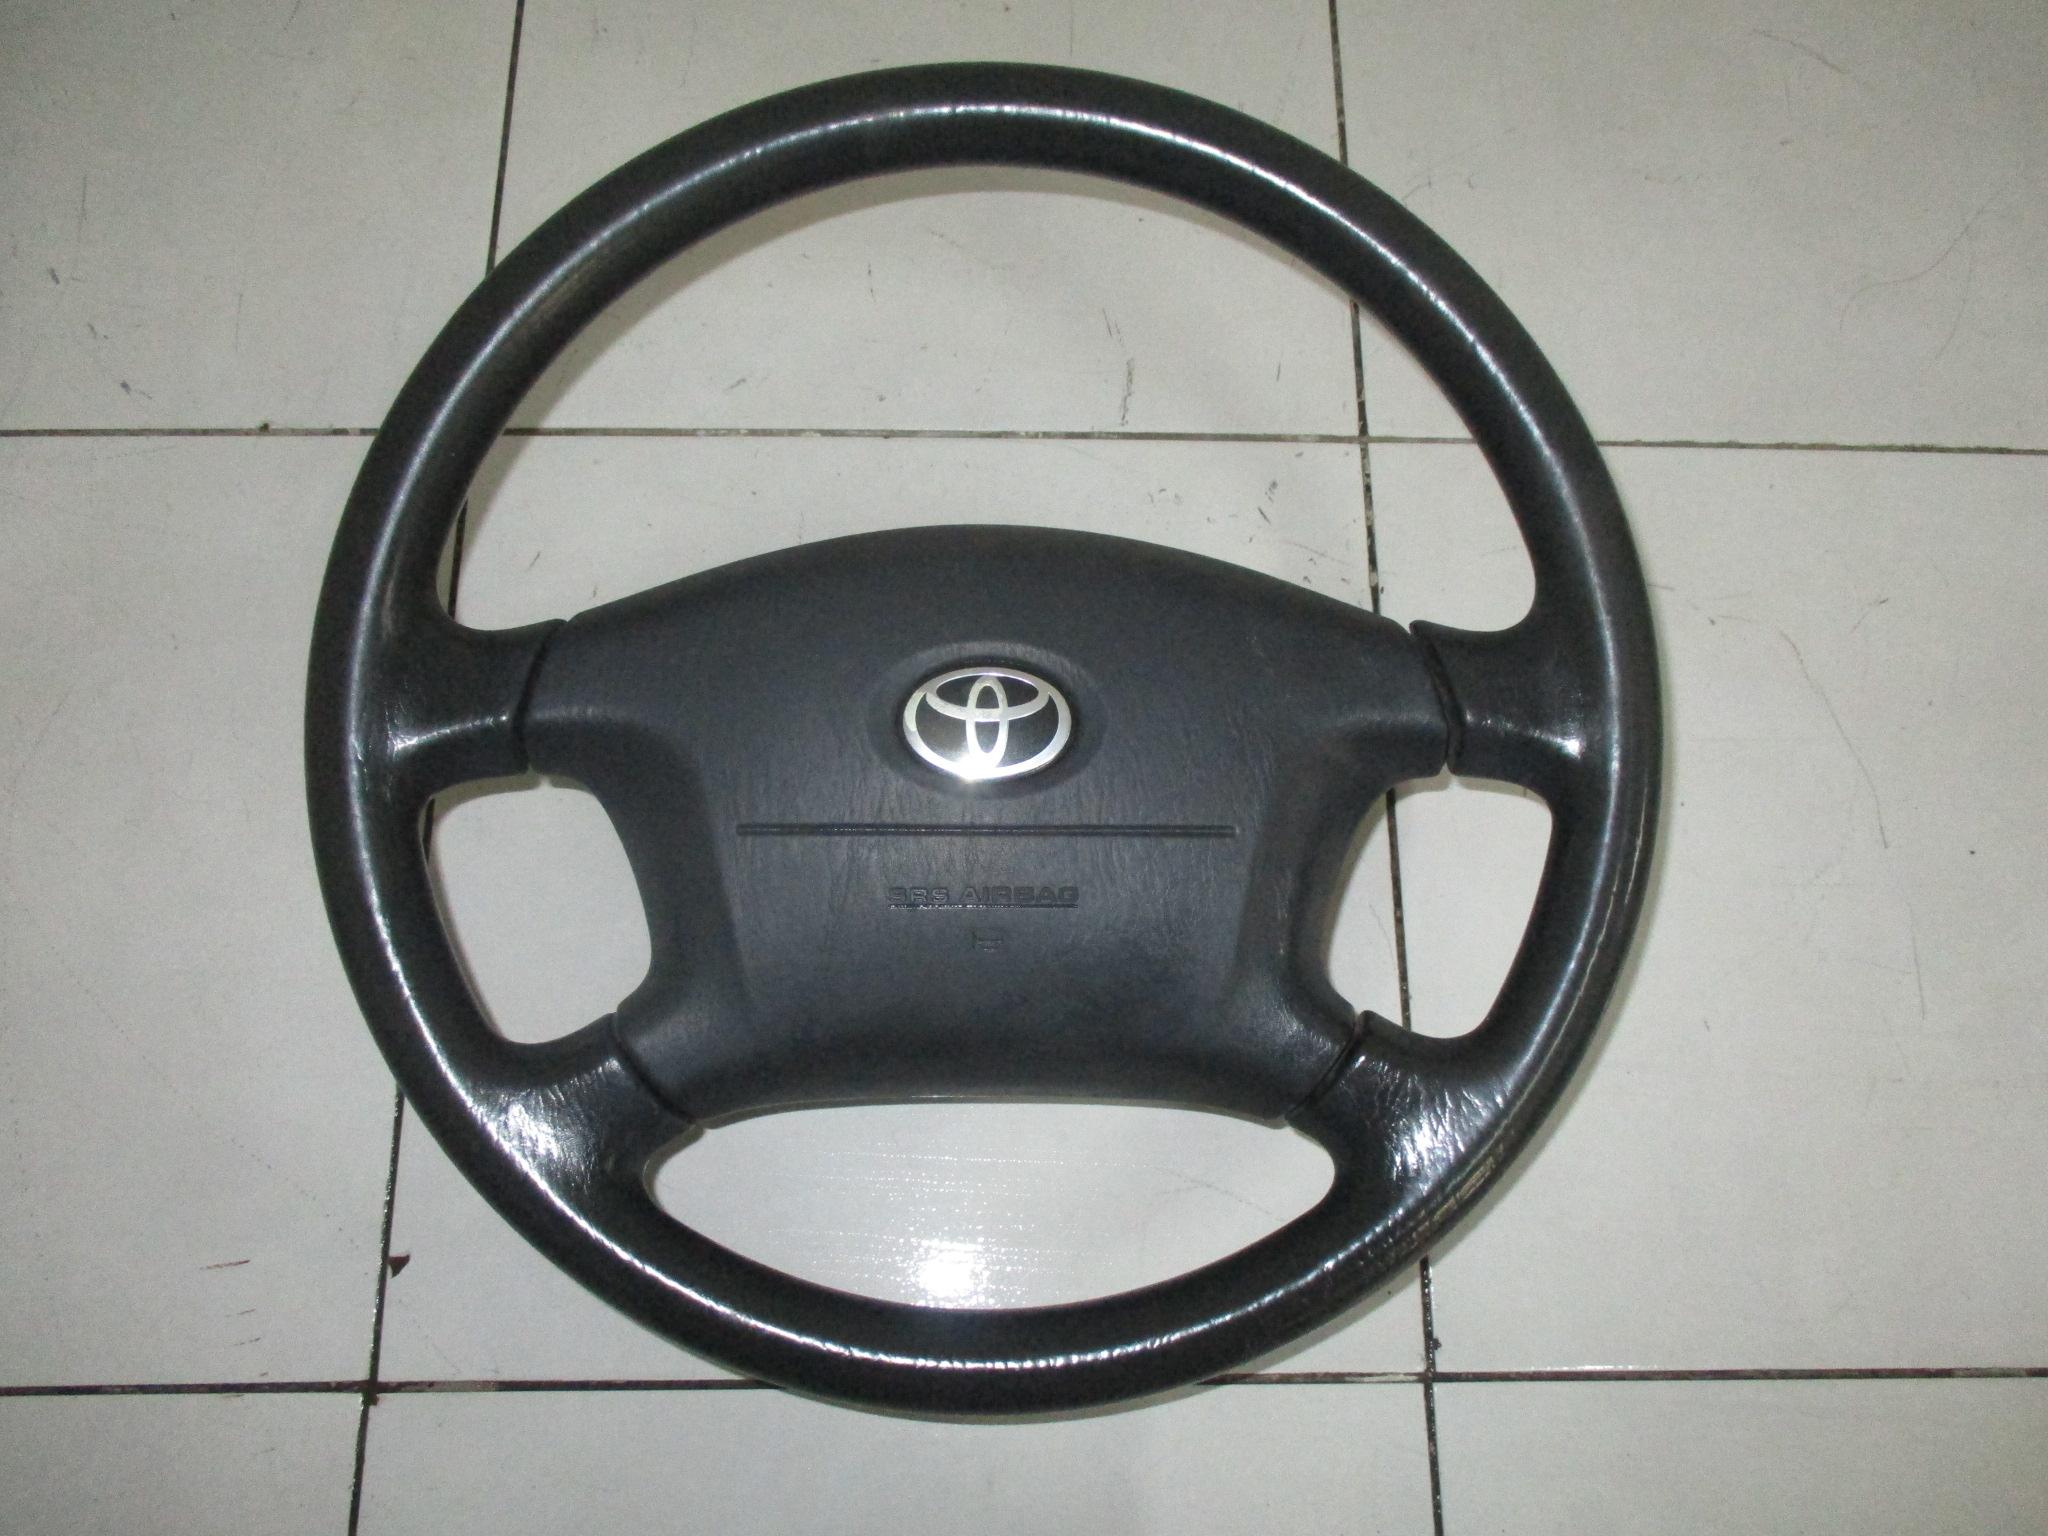 Corolla E11 Kierownica Poduszka Airbag Wijewo 6687052711